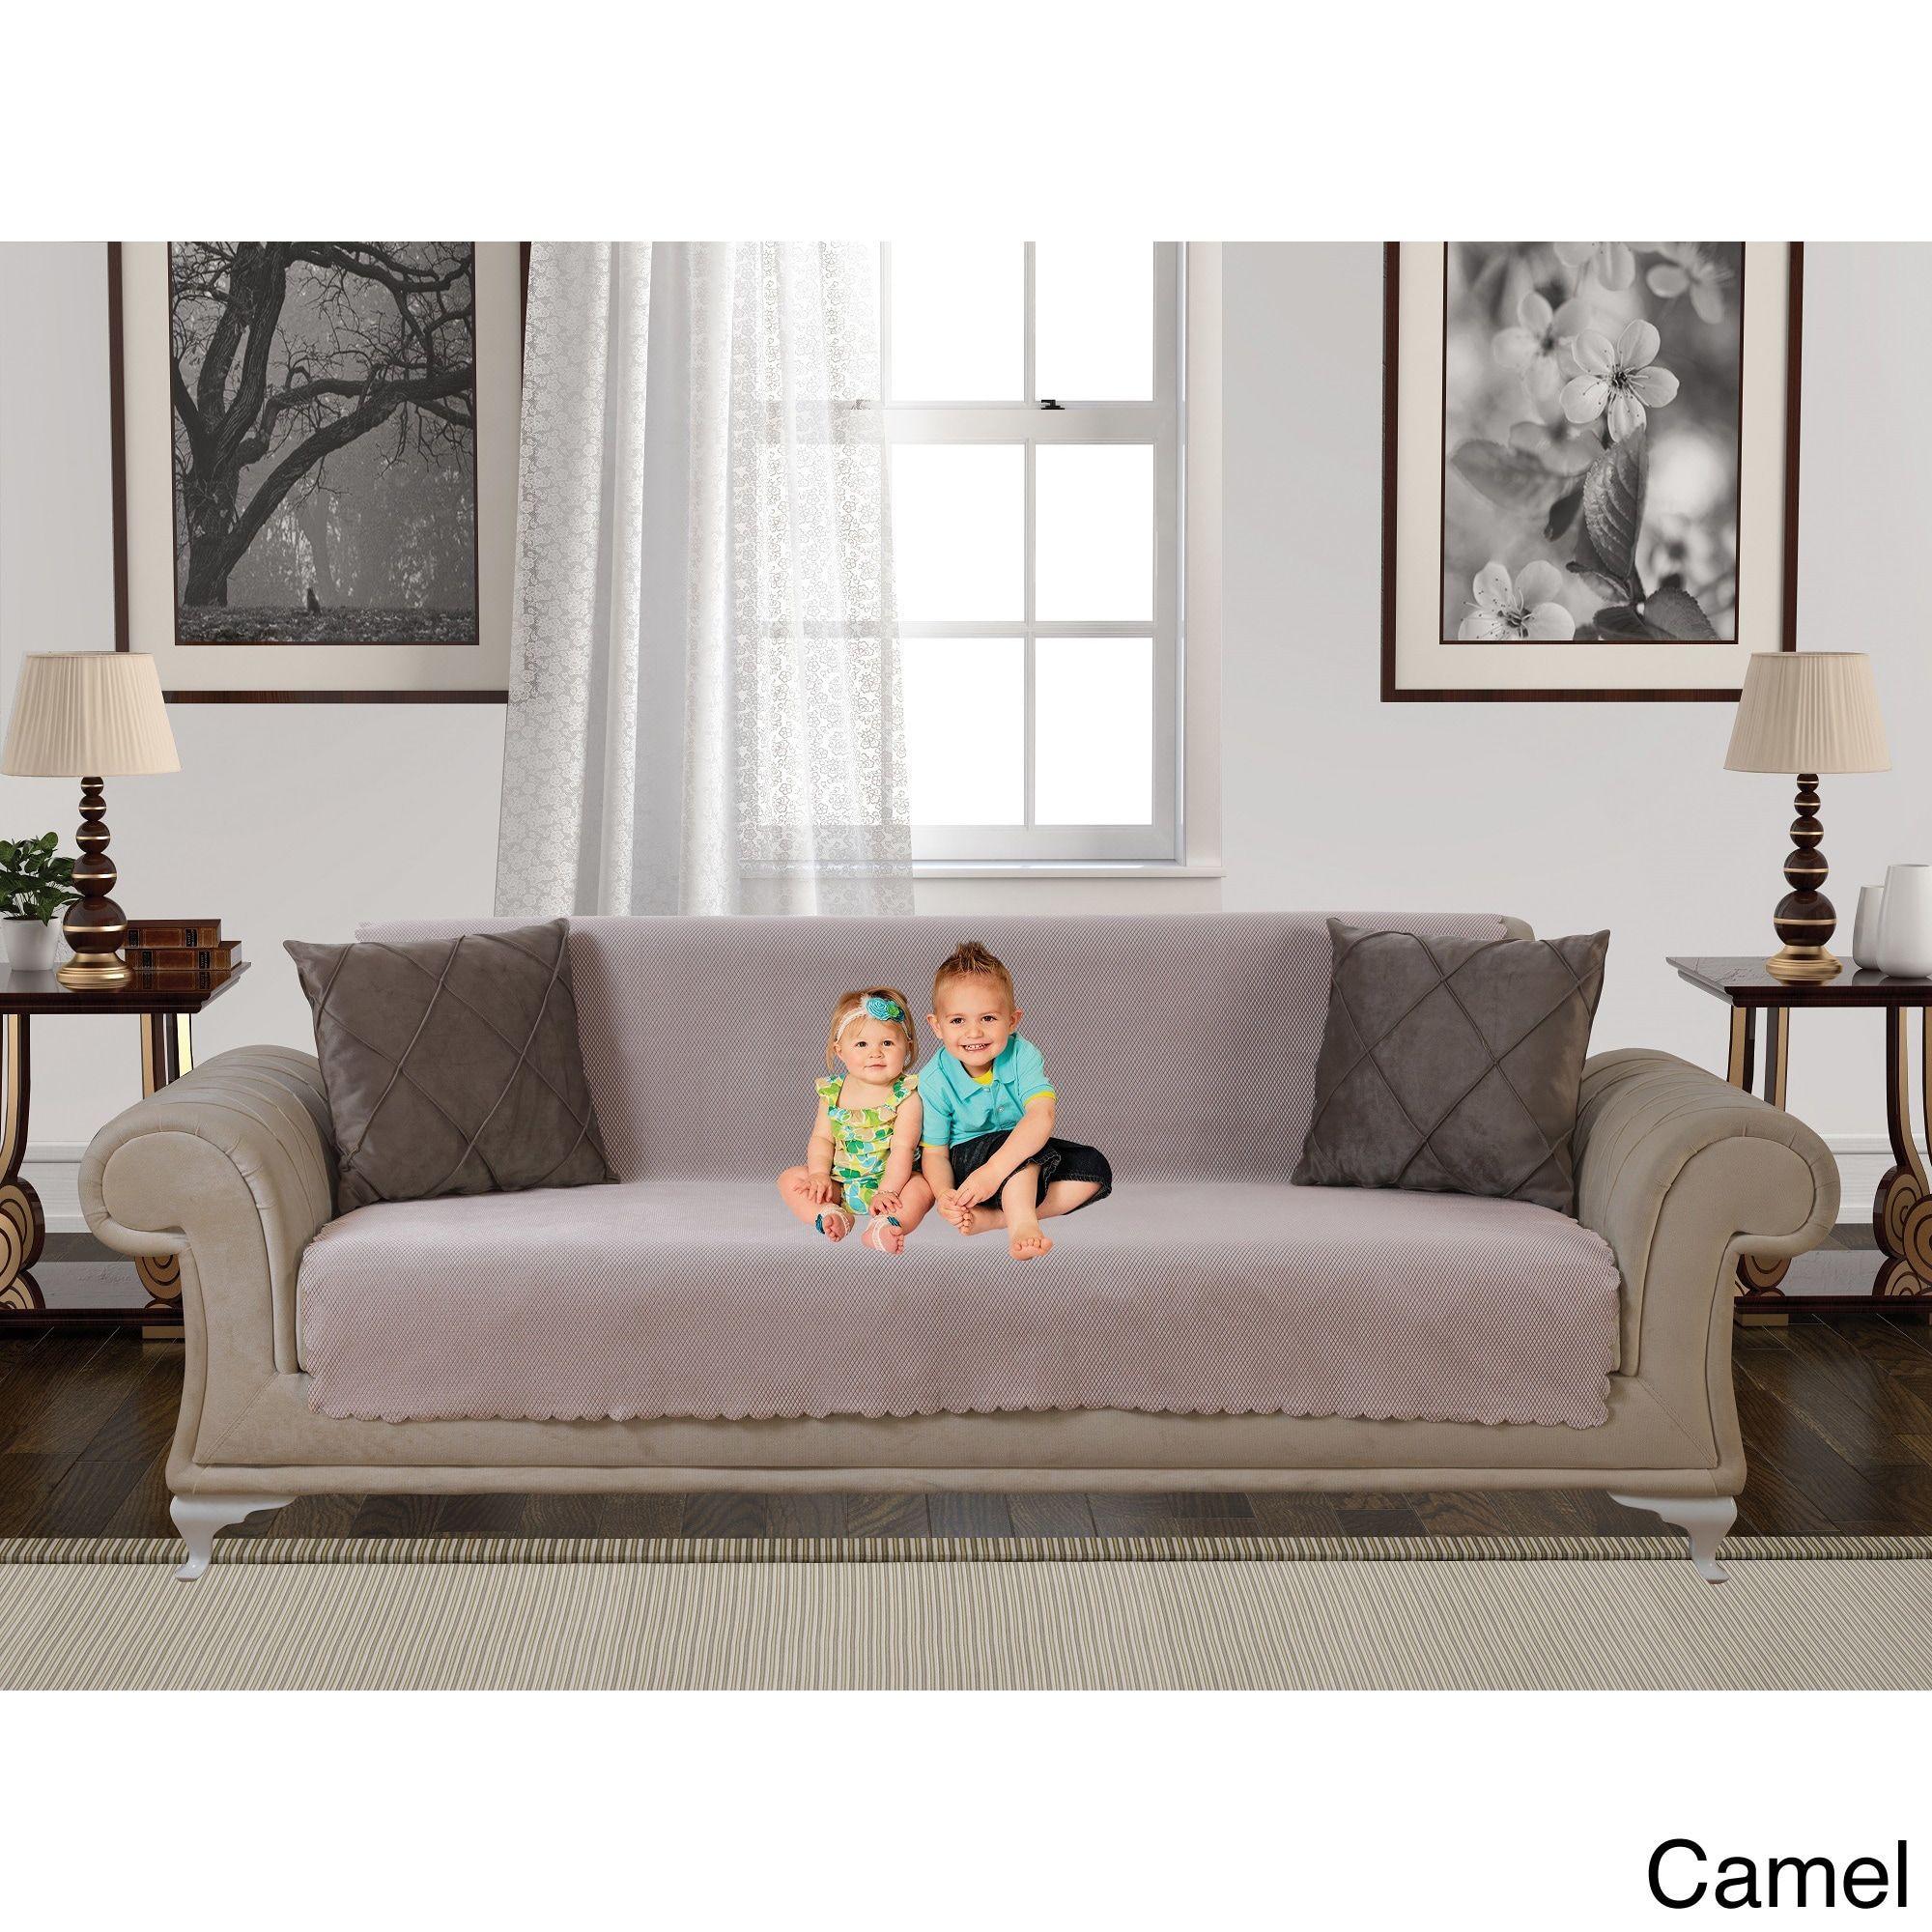 Prime Chiara Rose Anti Slip Armless 1 Piece Pet Dog Couch Shield Download Free Architecture Designs Scobabritishbridgeorg